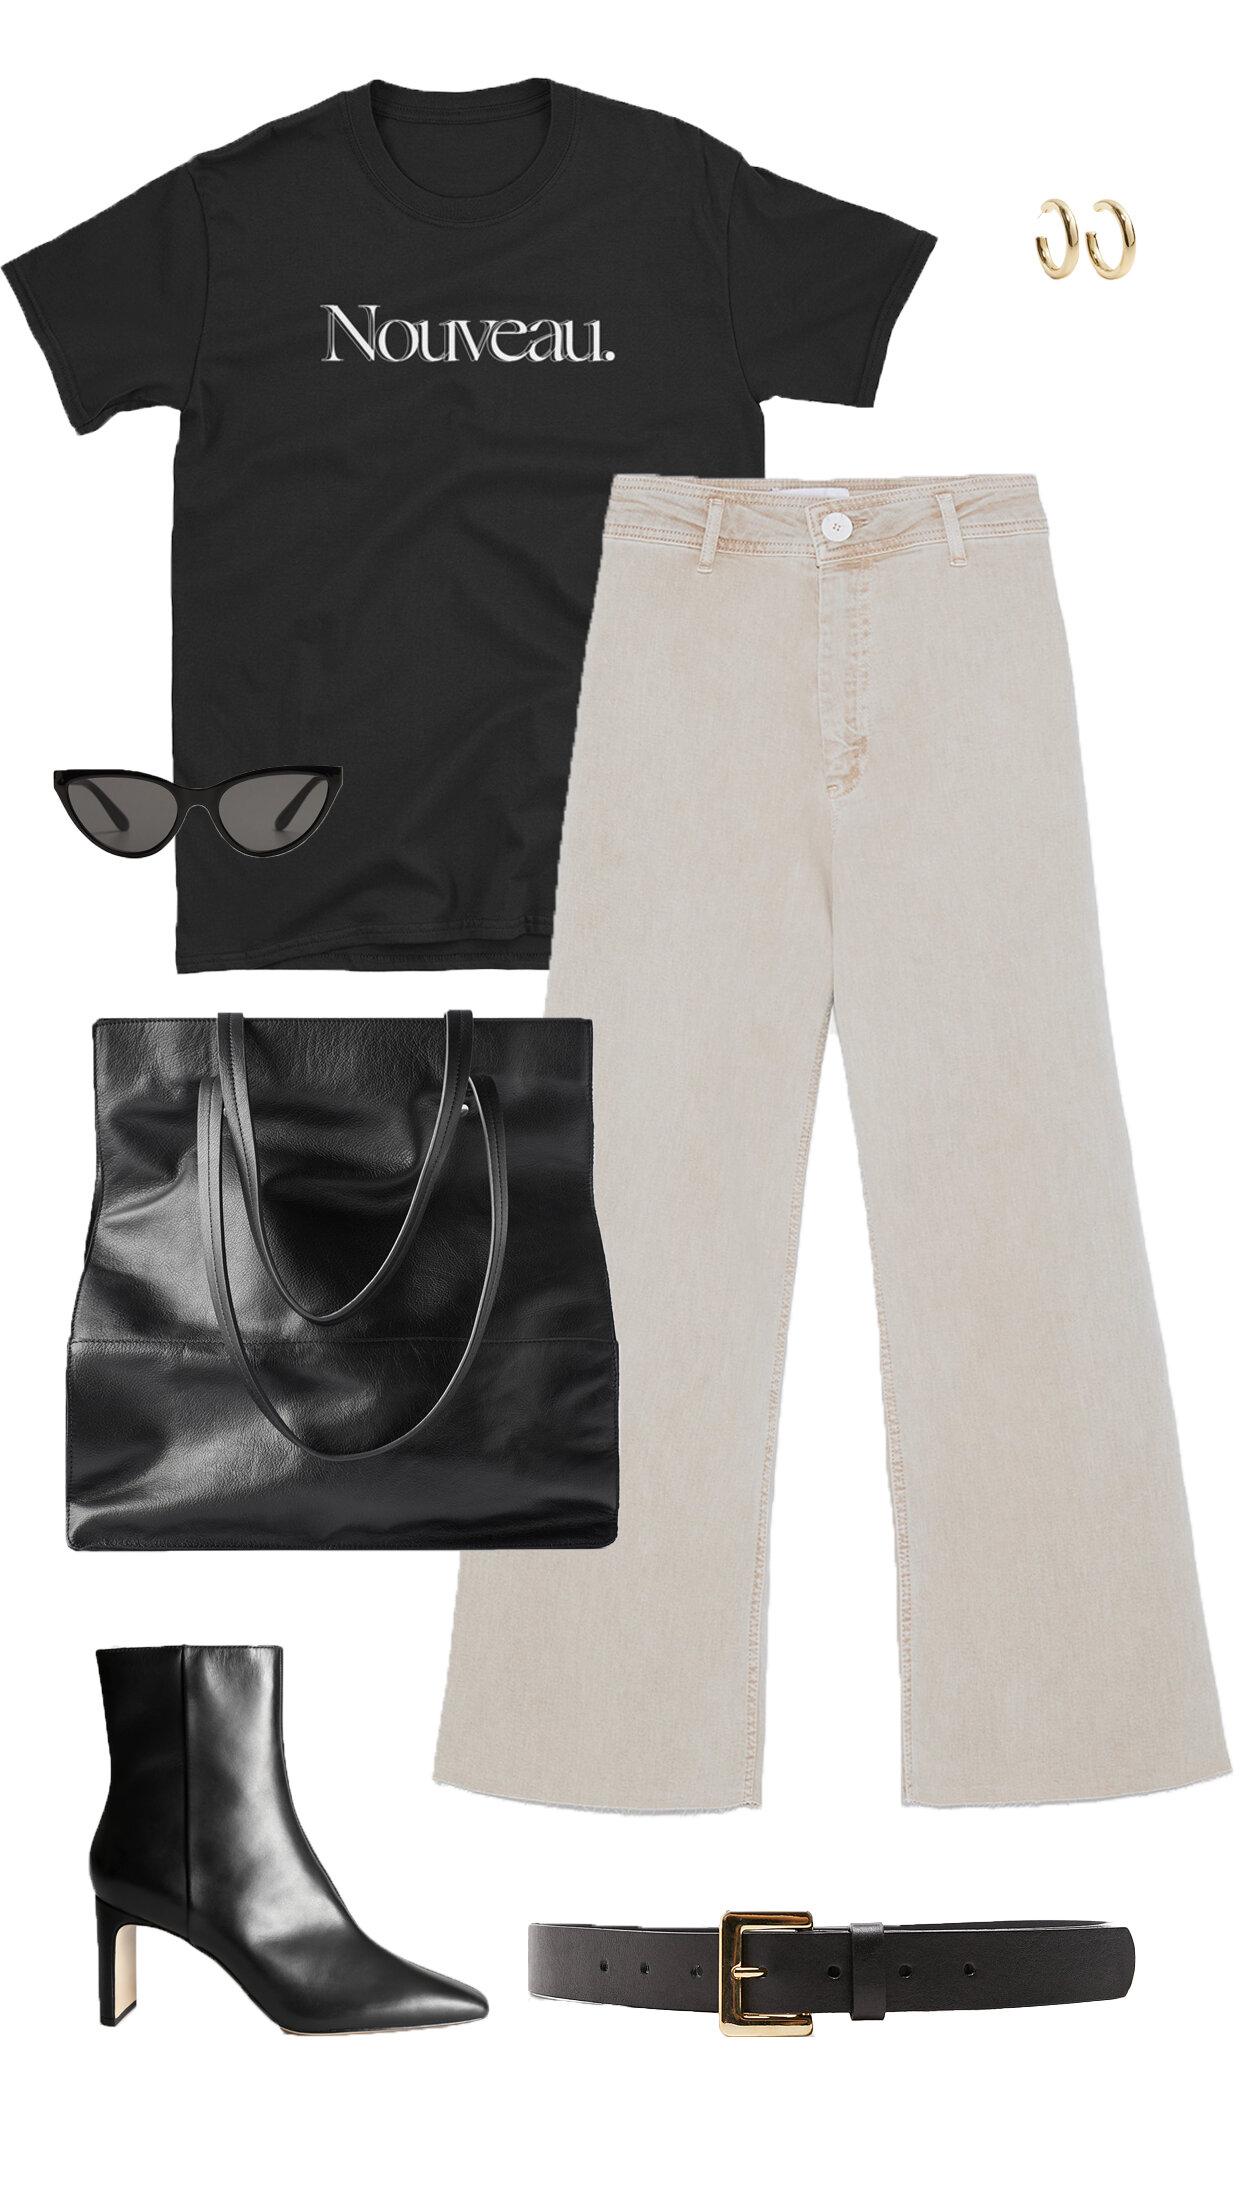 outfit-ideas.jpg